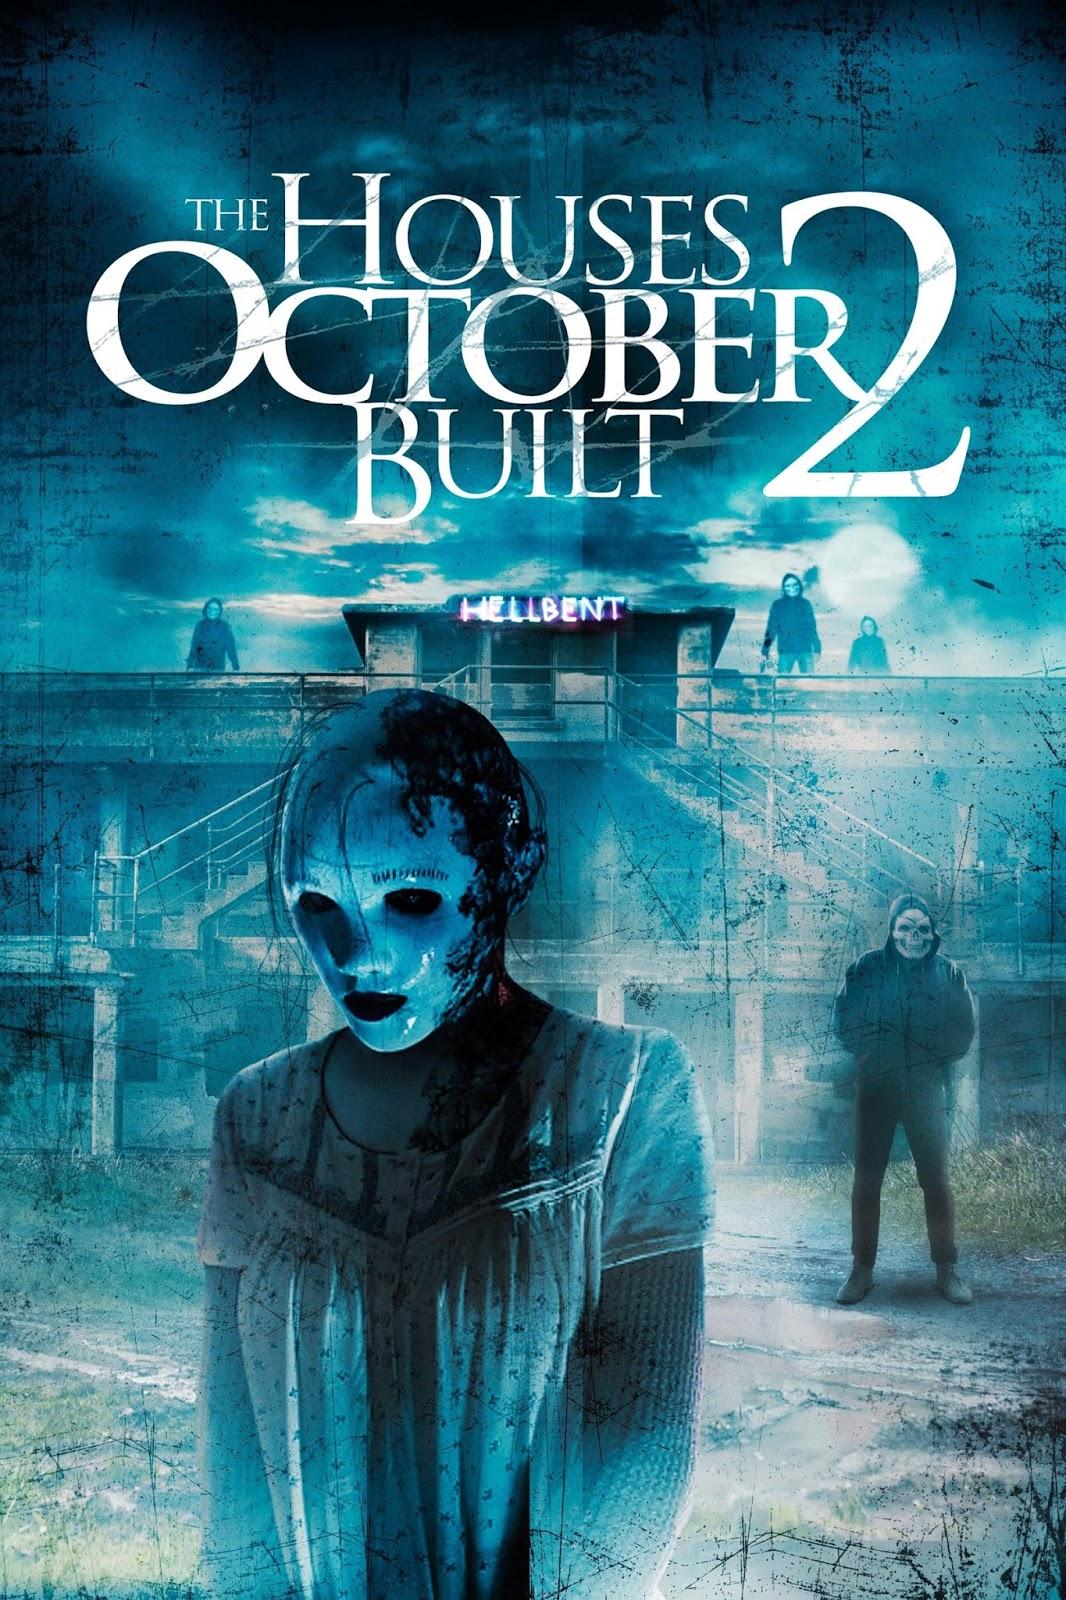 The Houses October Built 2 Legendado